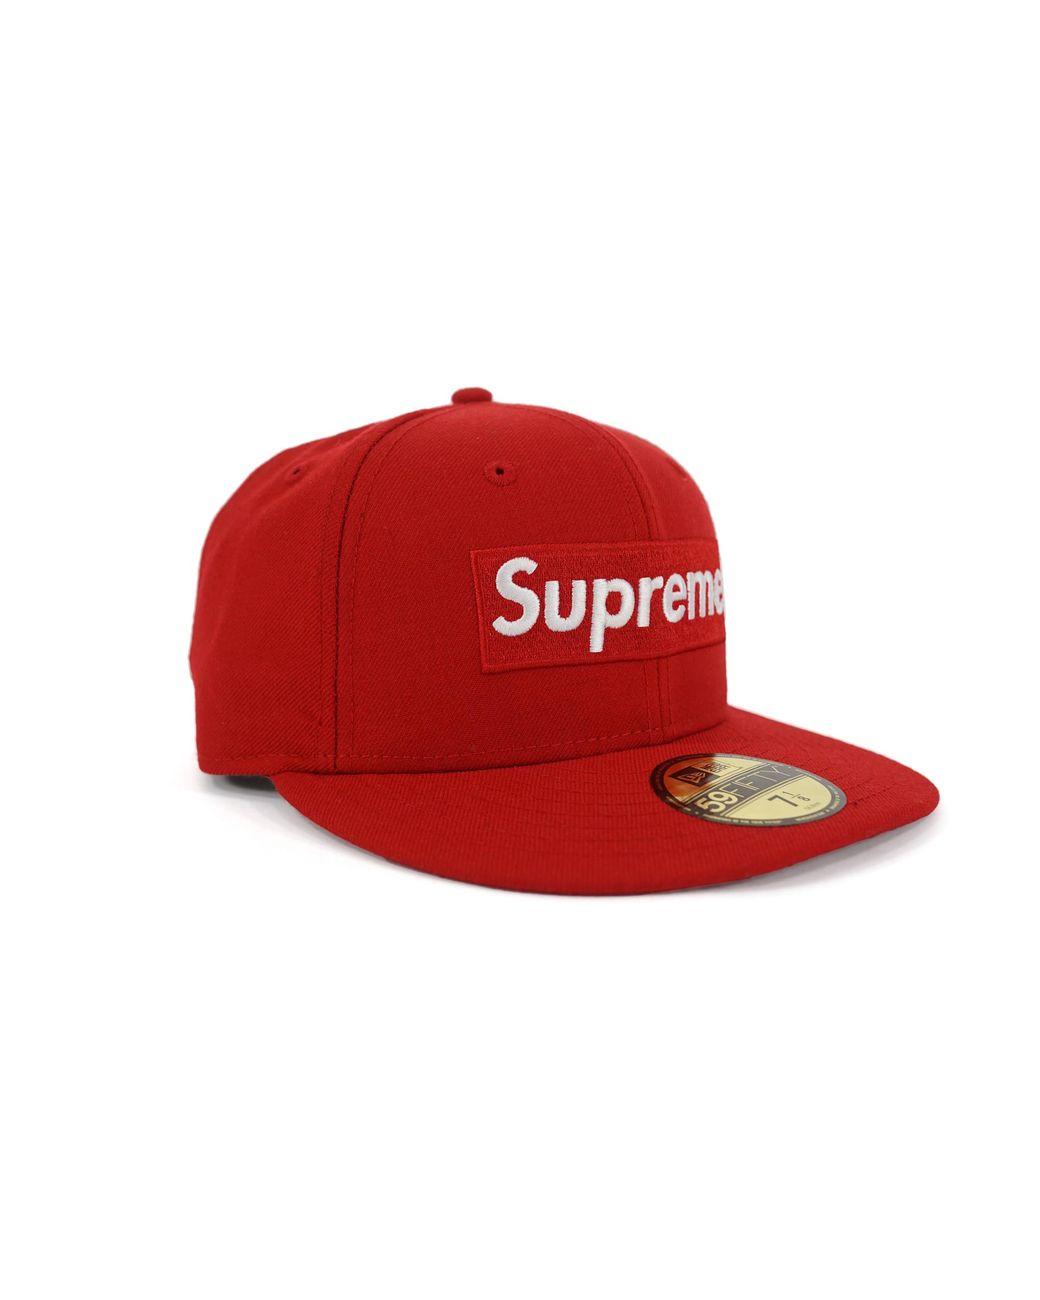 96b5dfa3 Supreme Playboy Box Logo New Era Cap Red in Red for Men - Lyst